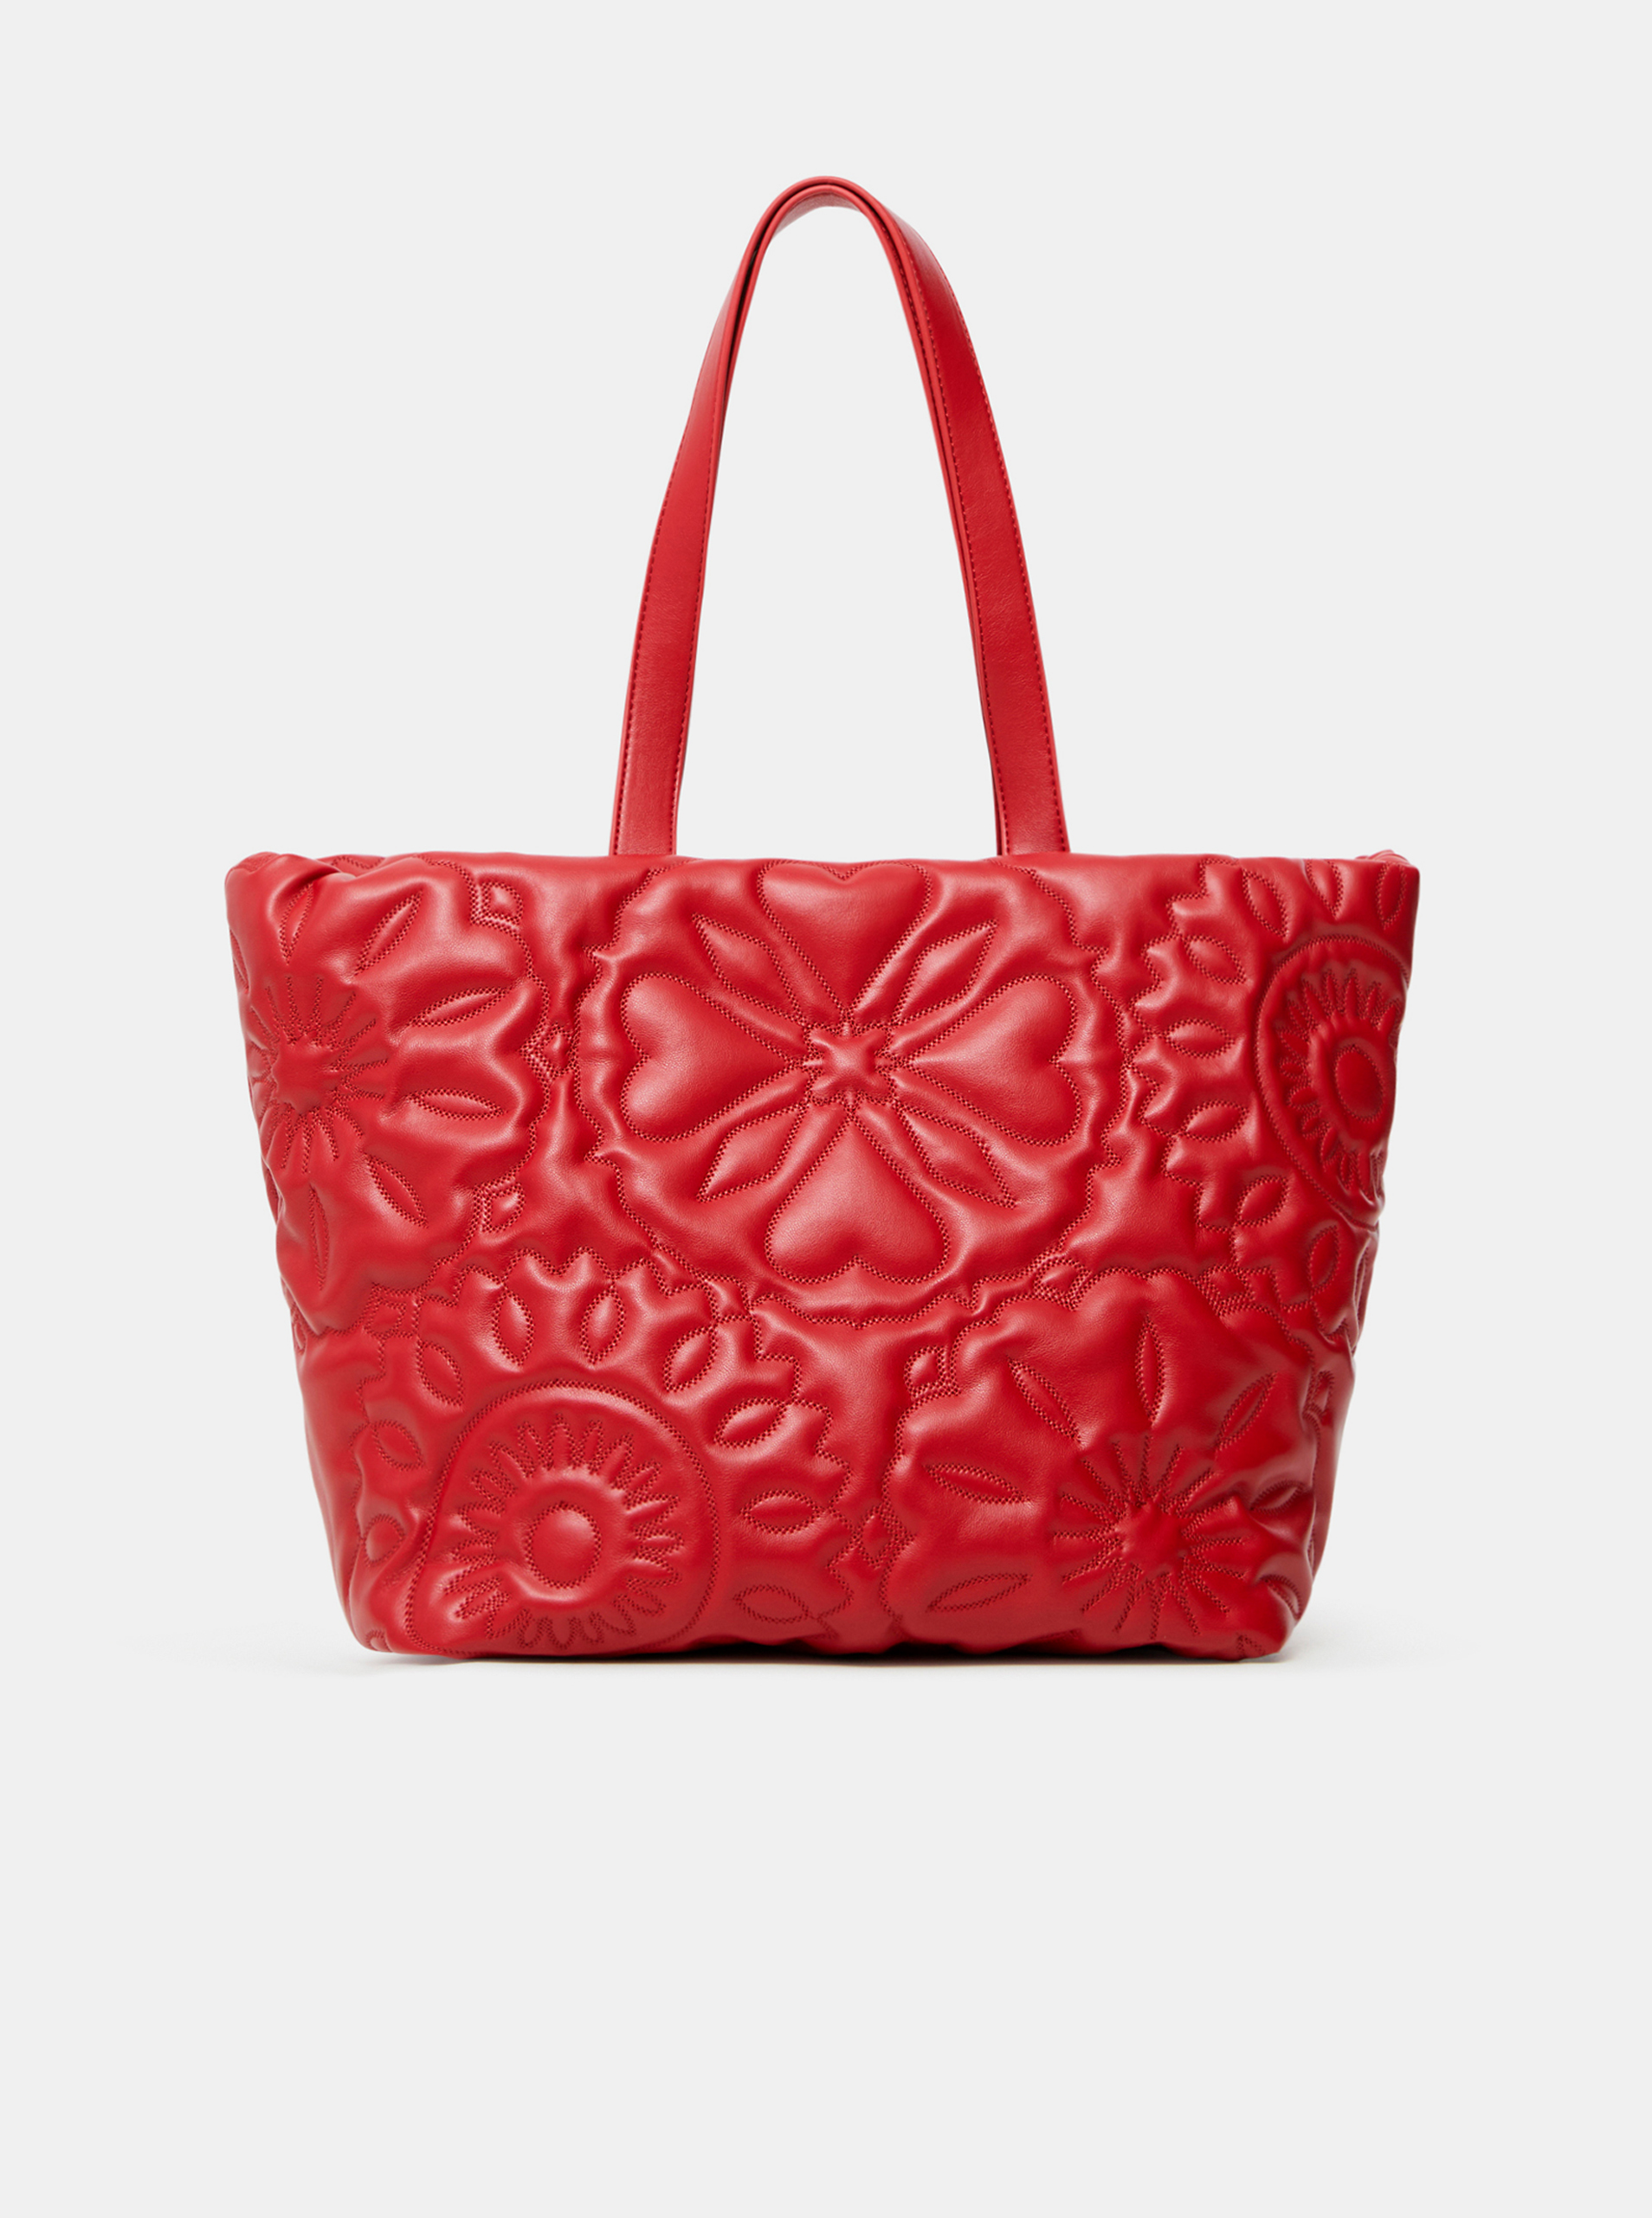 Desigual red handbag Big Big Bombay